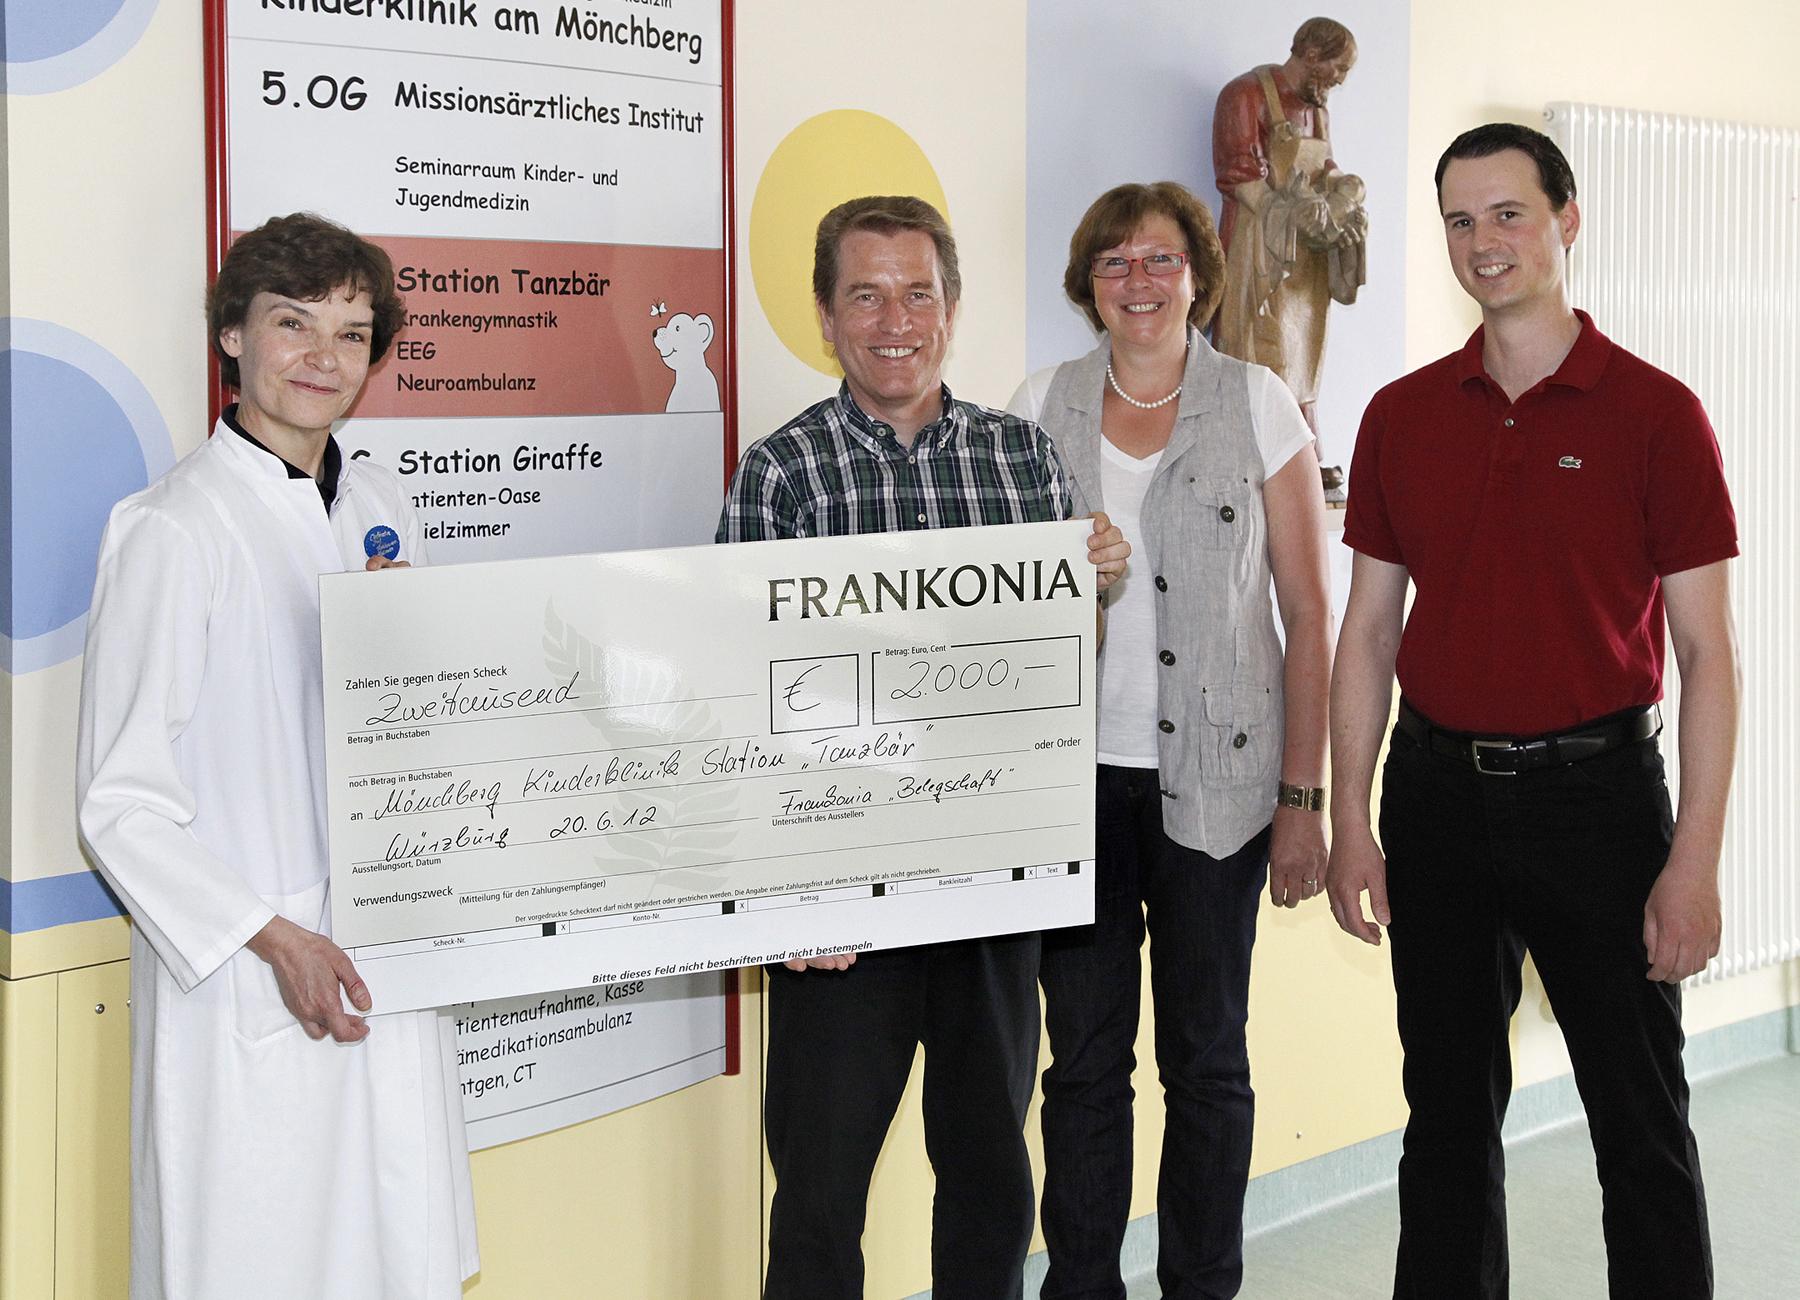 Entfernungsmesser Jagd Frankonia : Jagd shop angebote für jagdbedarf jagdzubehör und jagdbekleidung